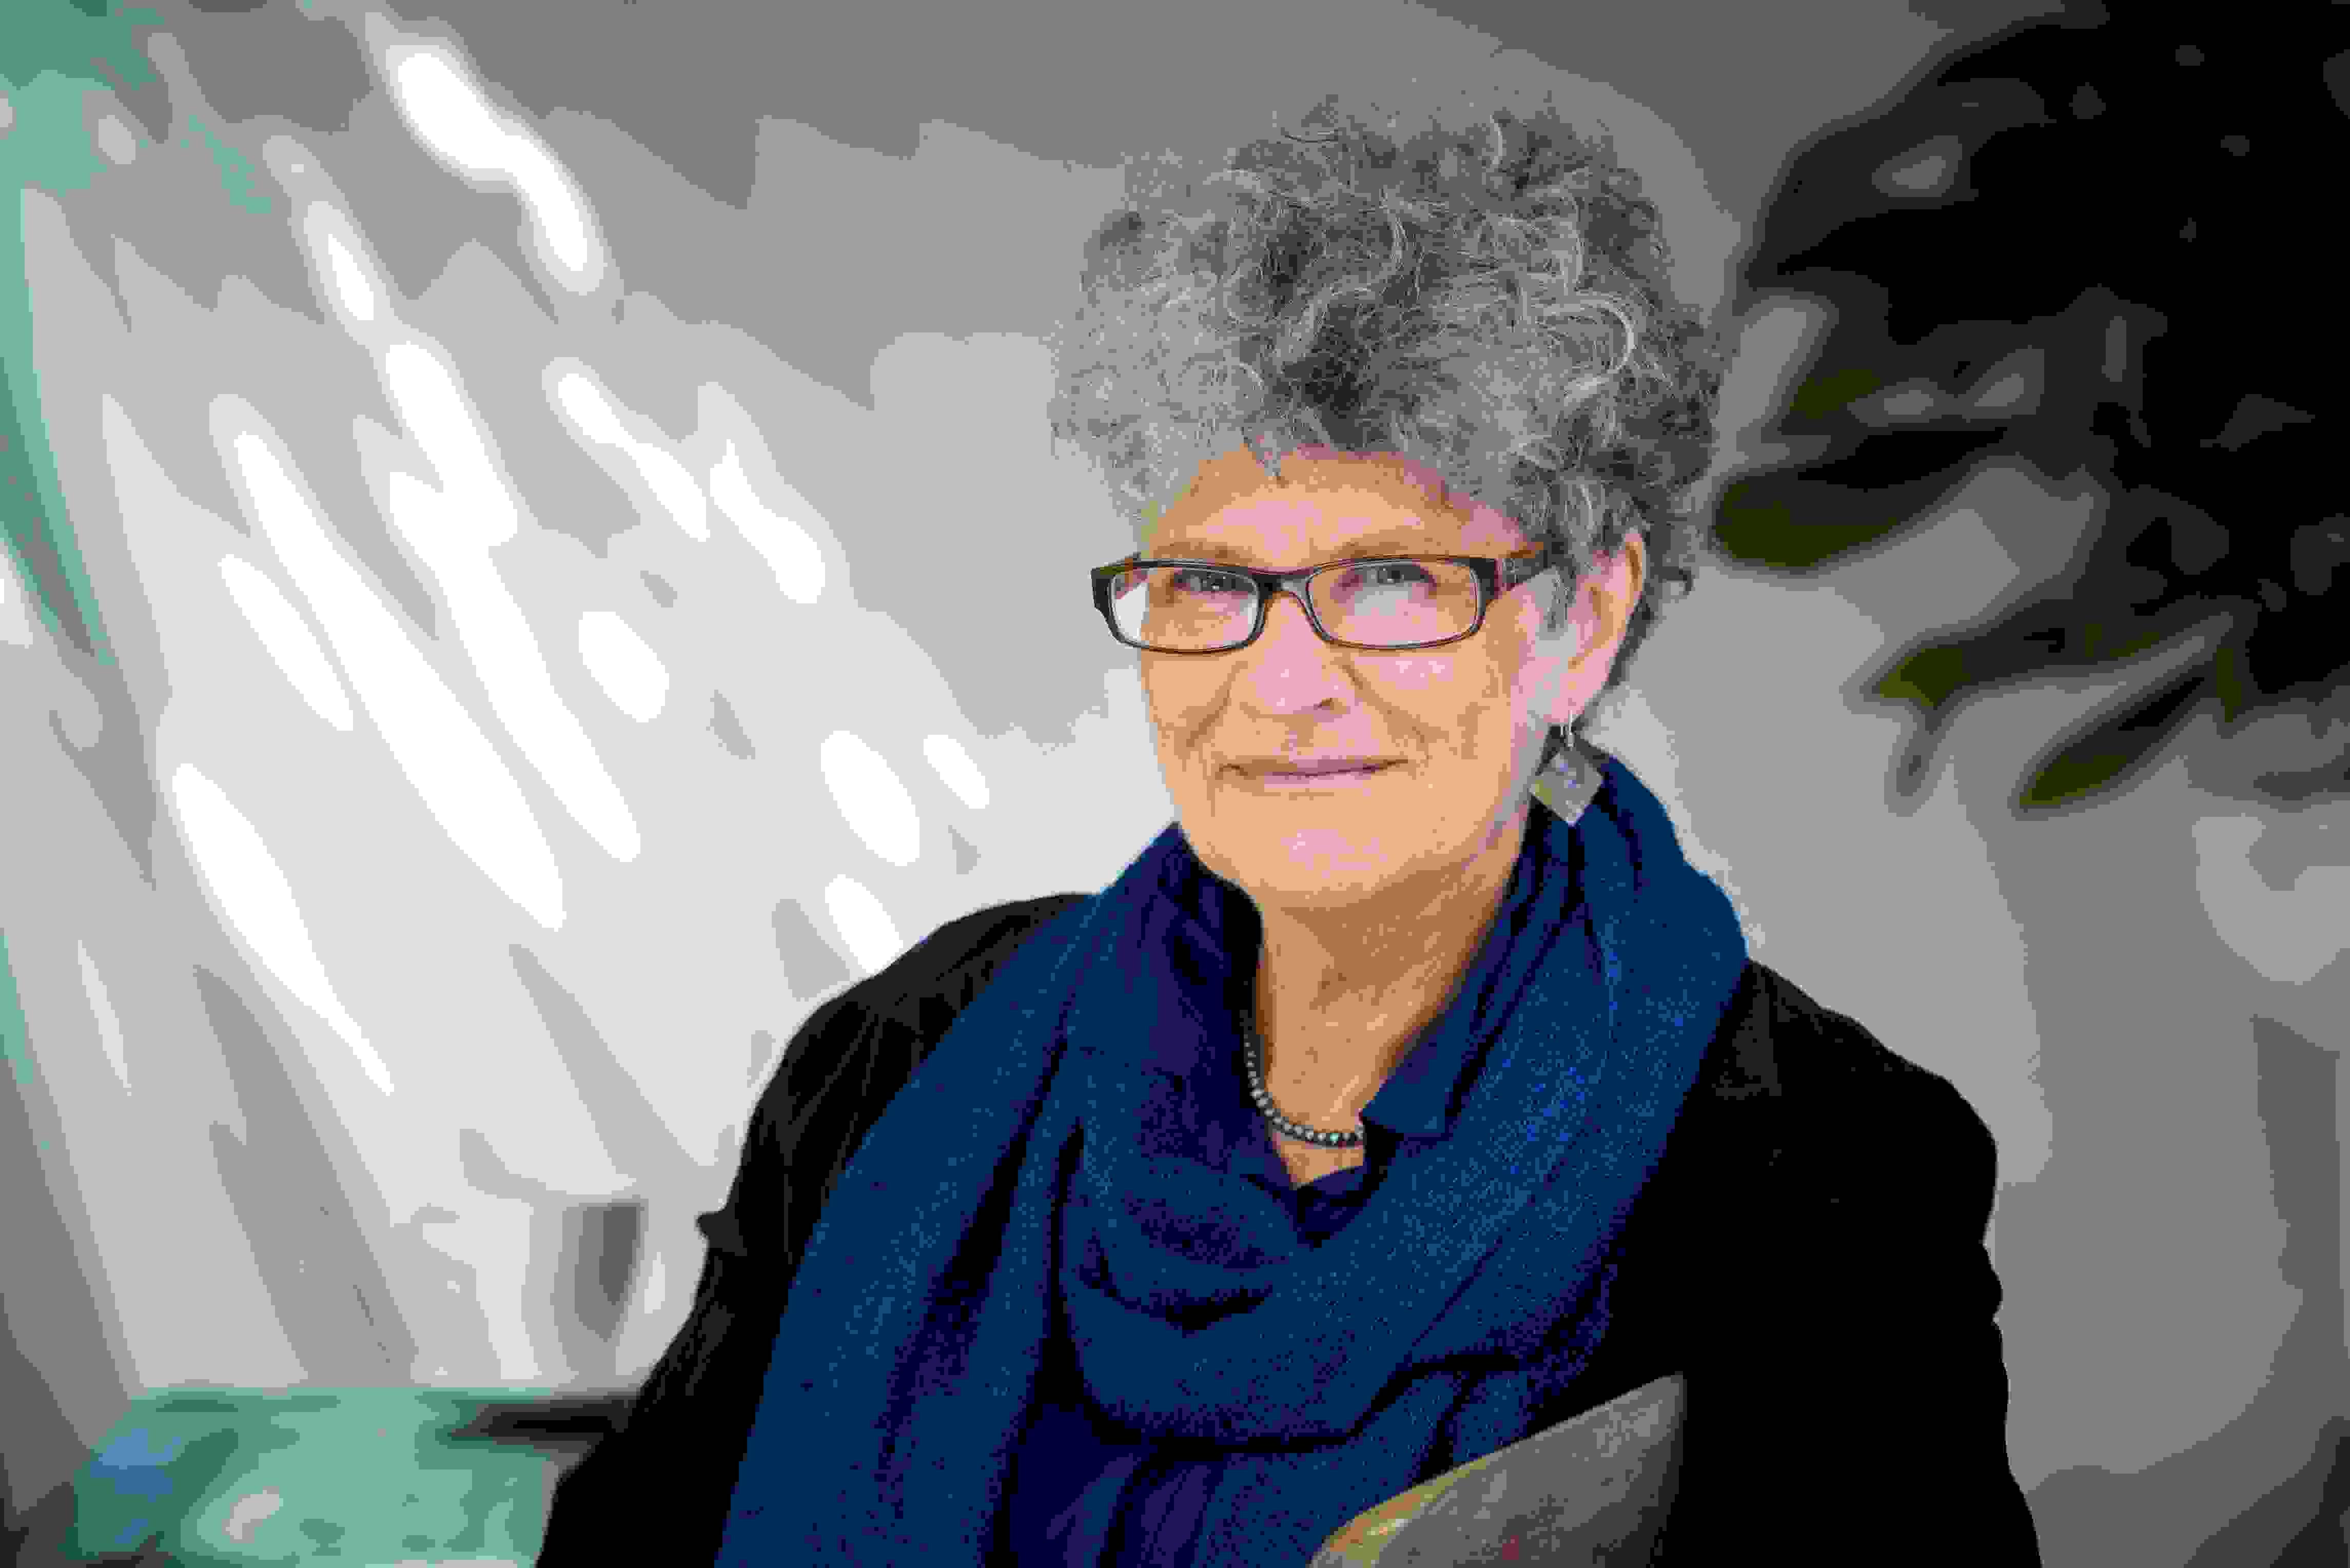 Kate Grenville: The Case Against Fragrance